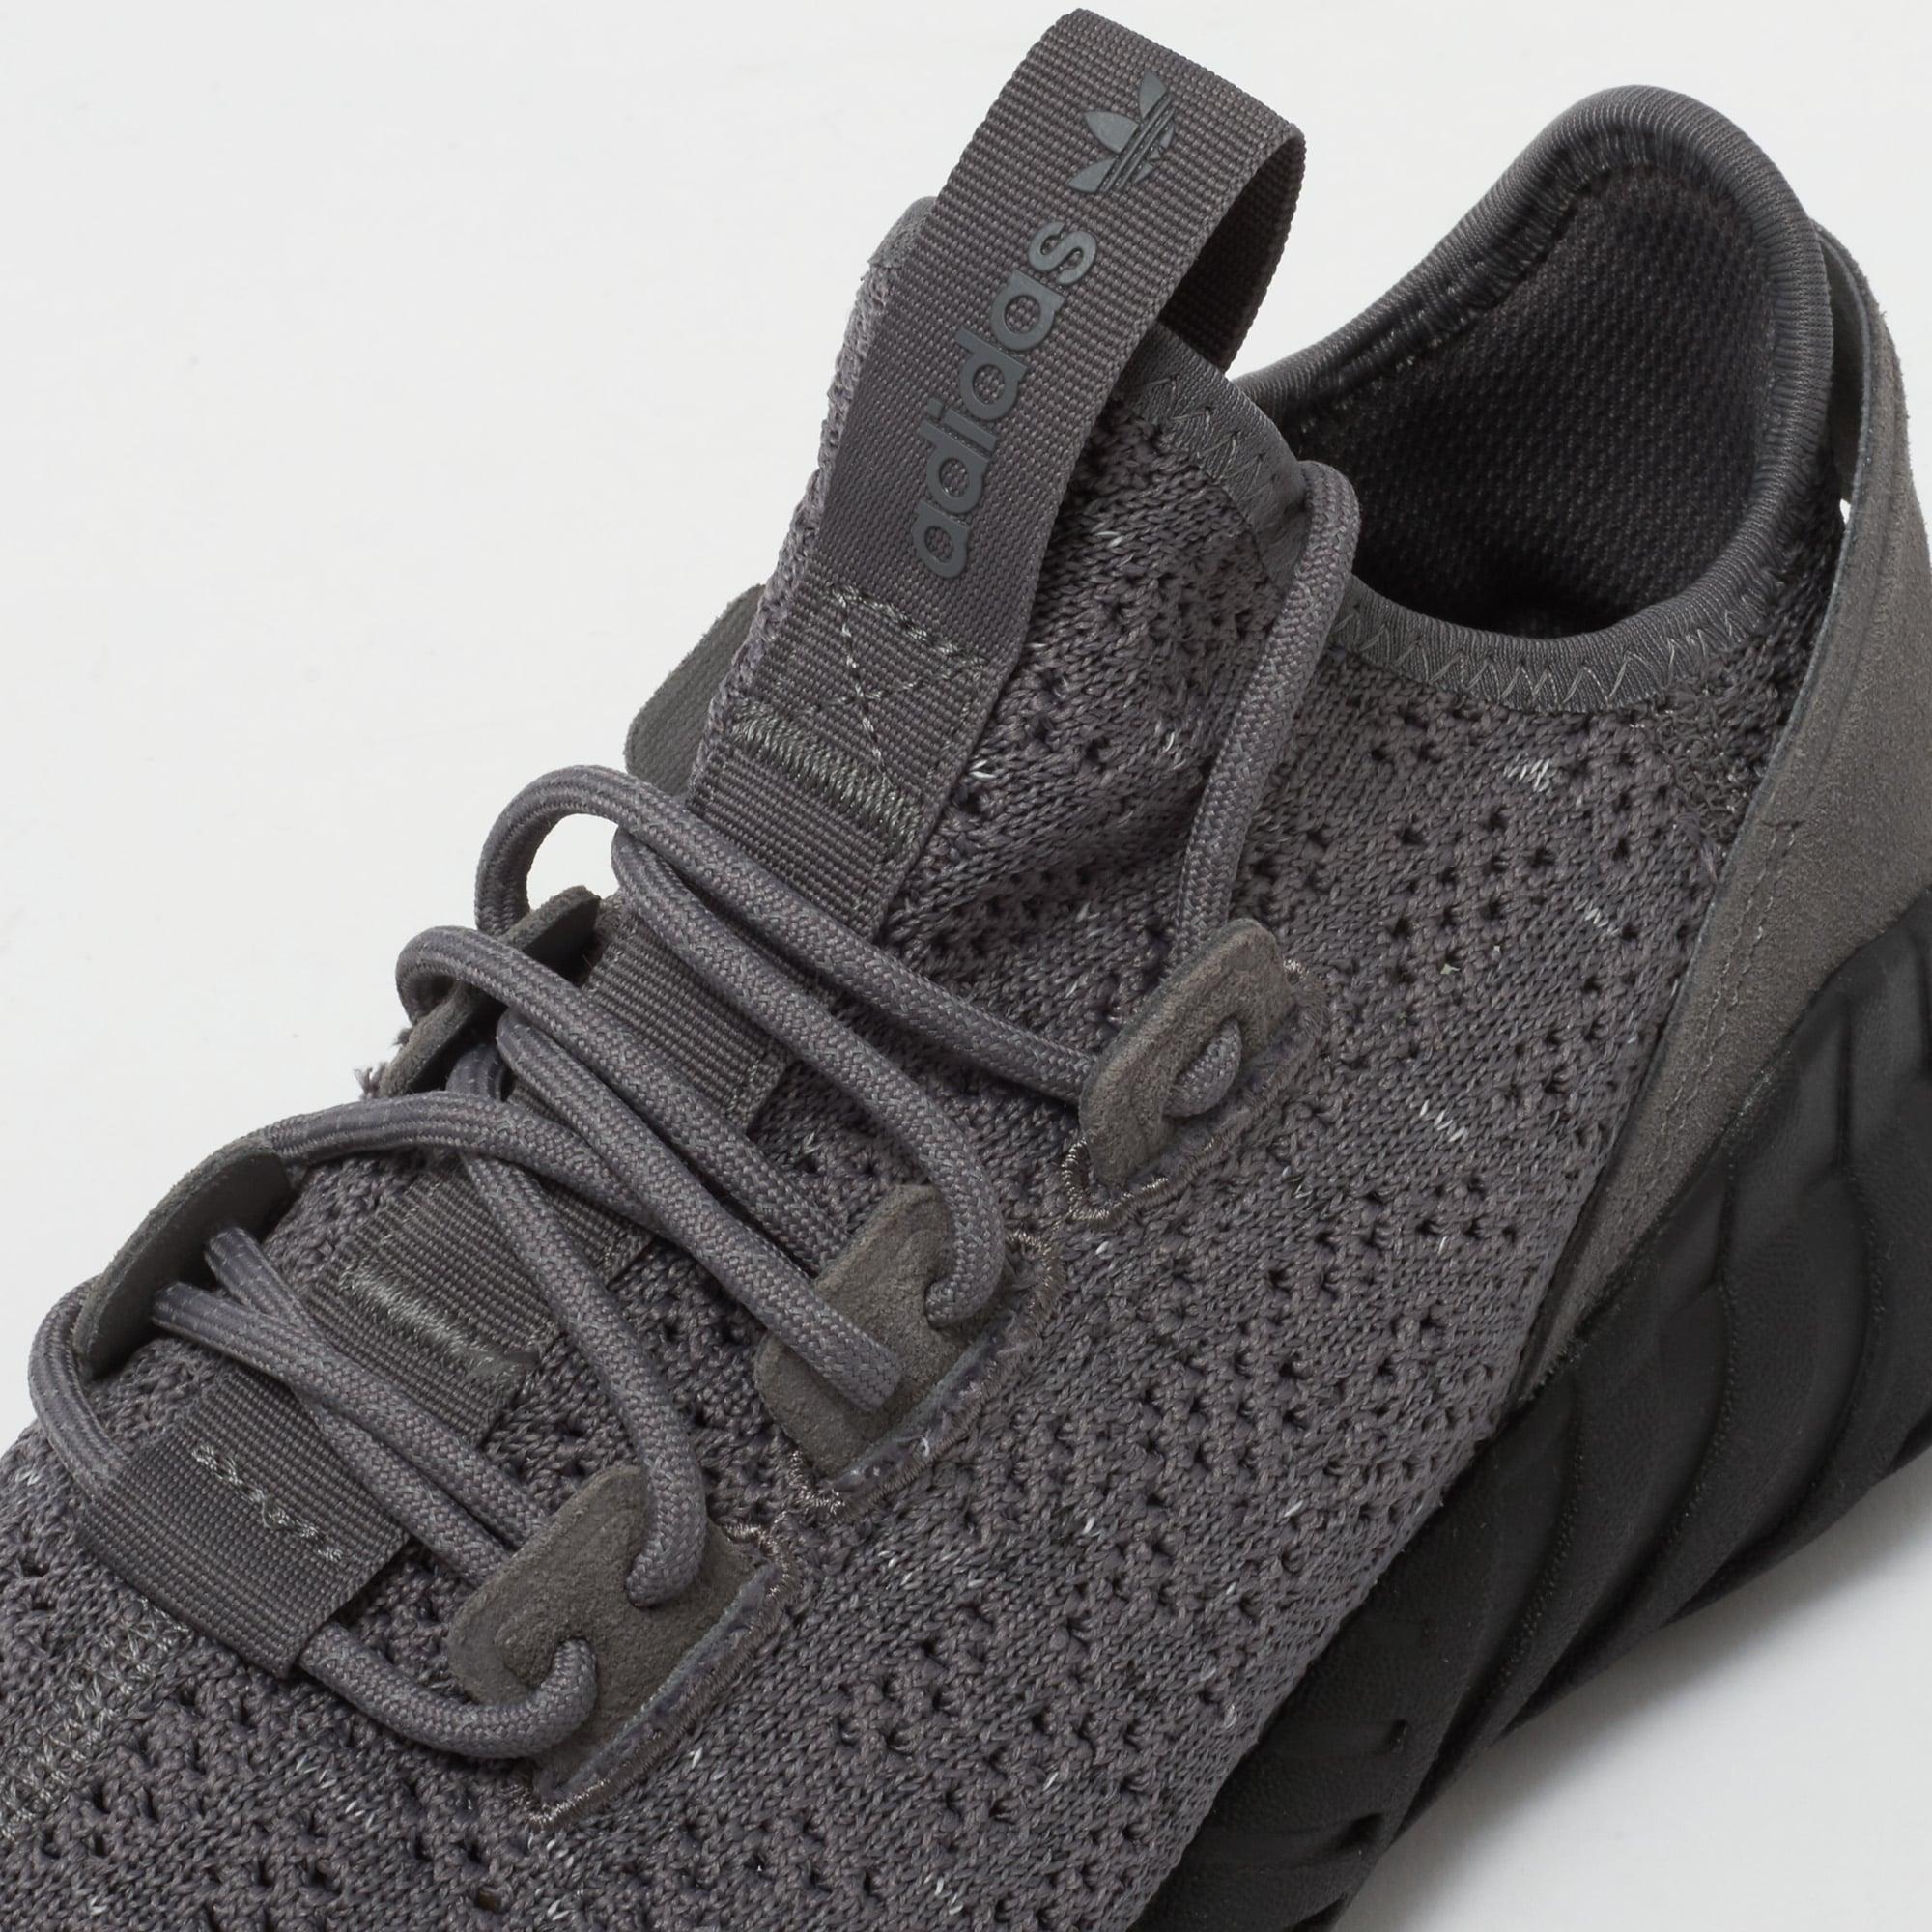 Cheap Adidas Originals Tubular Rise 2 ⃣DLY.SNKRS.Cheap Adidas.